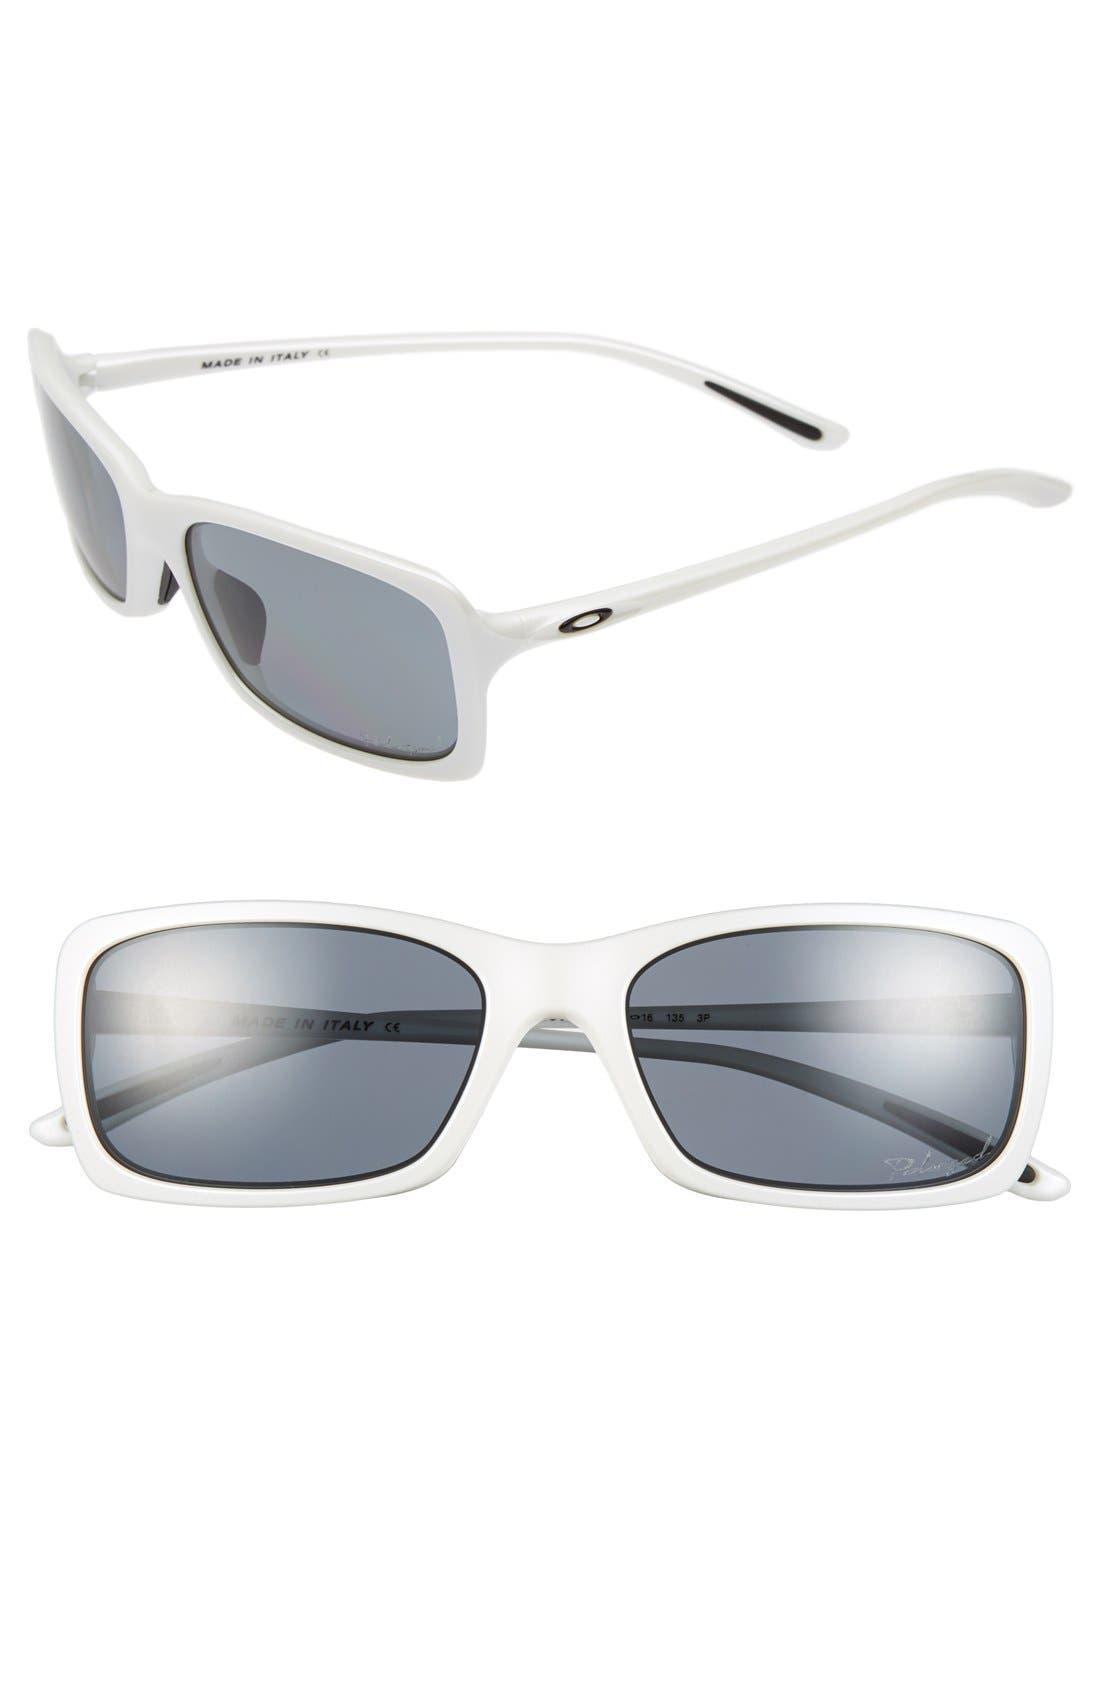 Main Image - Oakley 'Hall Pass' 56mm Polarized Sunglasses